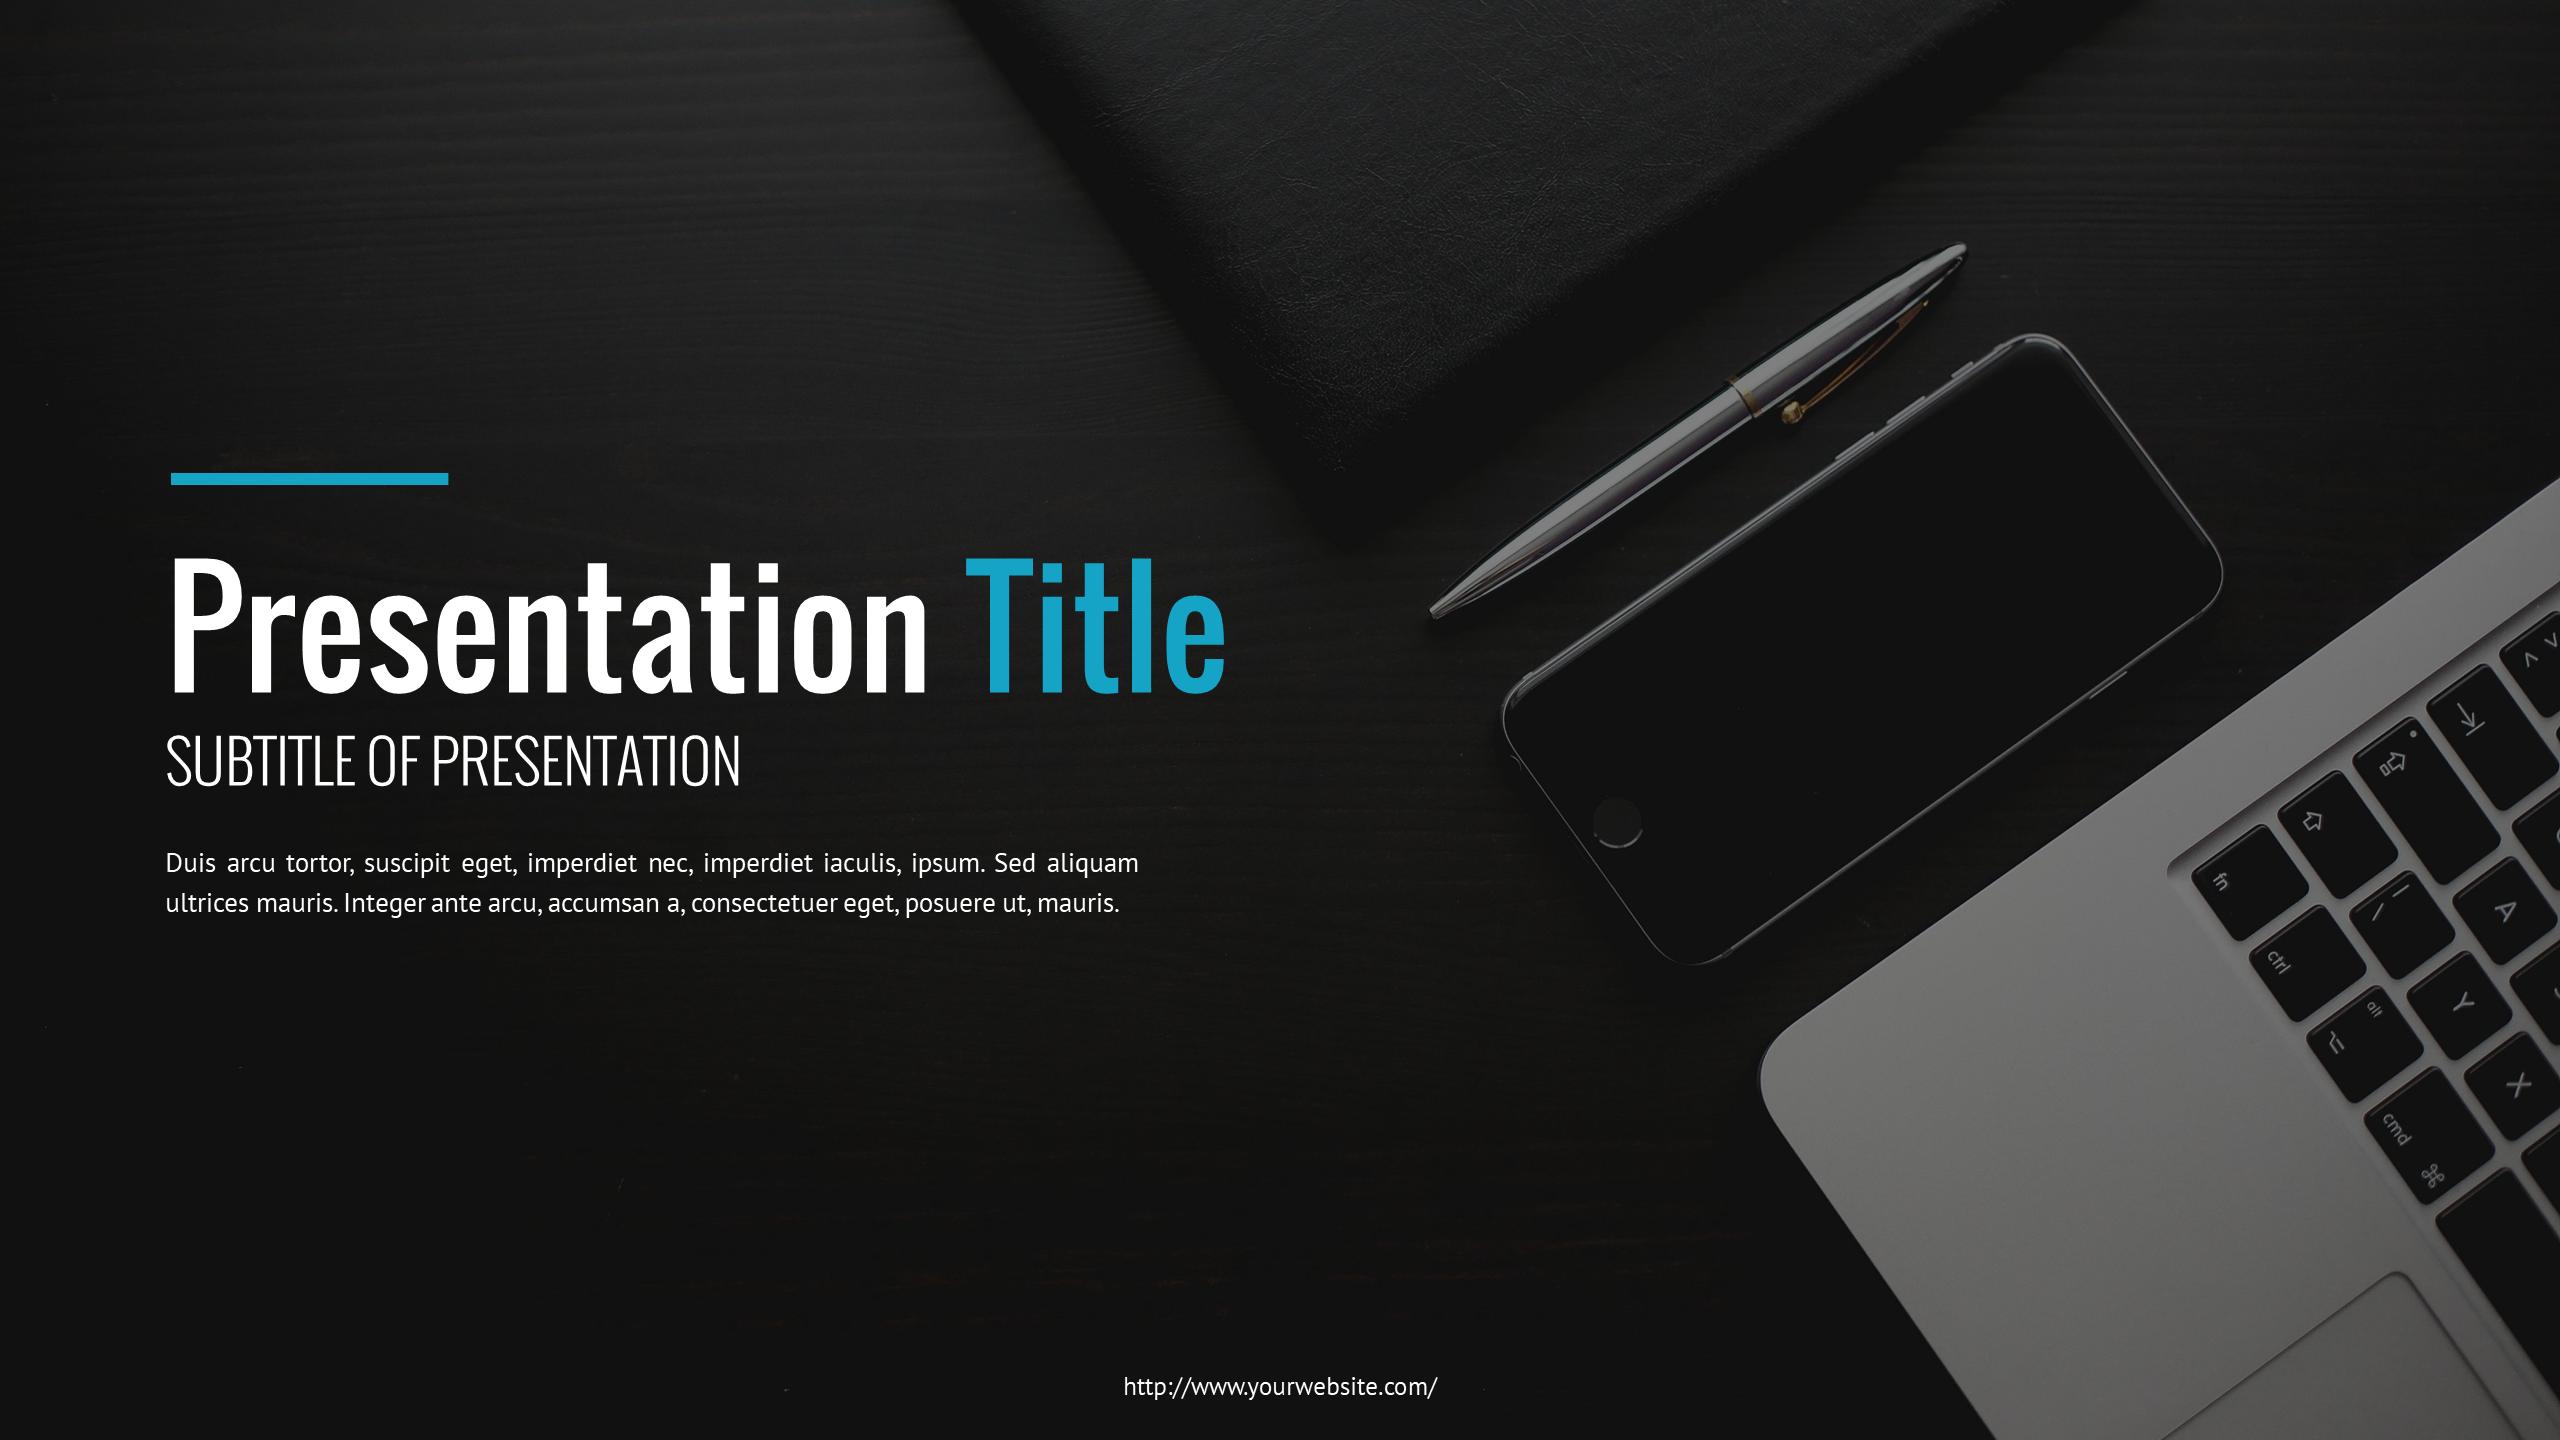 Cavale multipurpose powerpoint presentation template by m duarte slide 001 toneelgroepblik Image collections